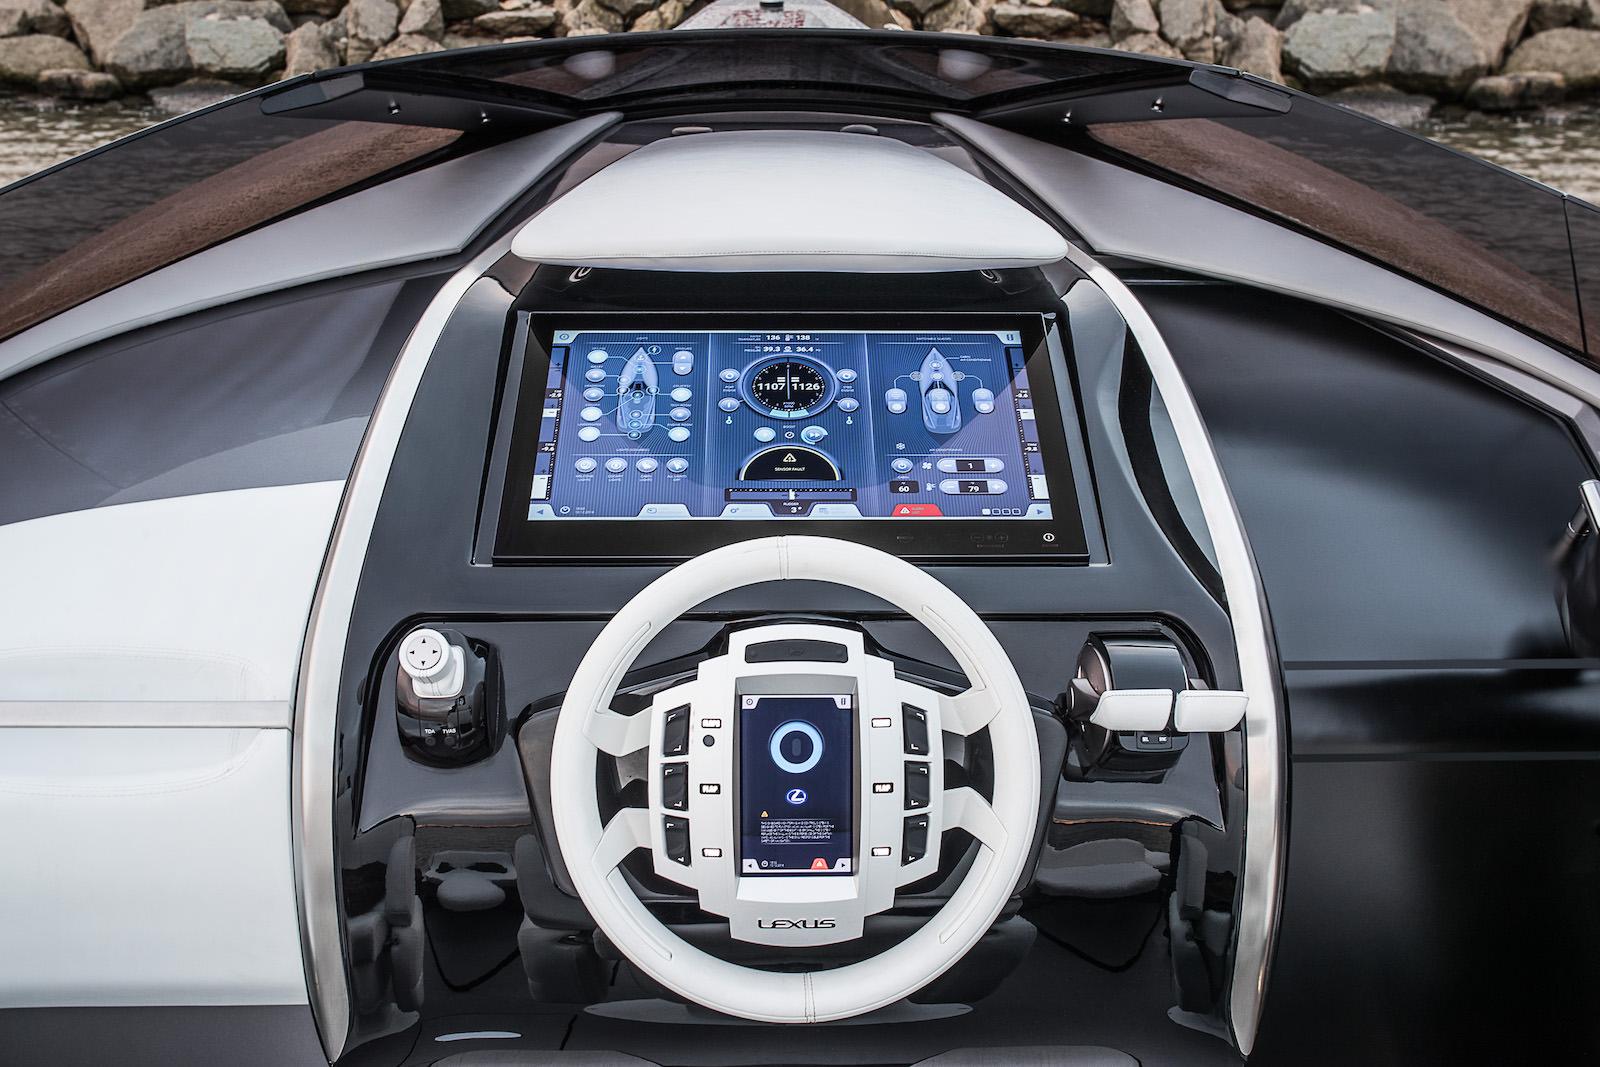 Lexus_Sport_Yacht_concept_12_C0C6BD82A617DB6BD3EDF8AE3D2D89A2FDB2848B-1